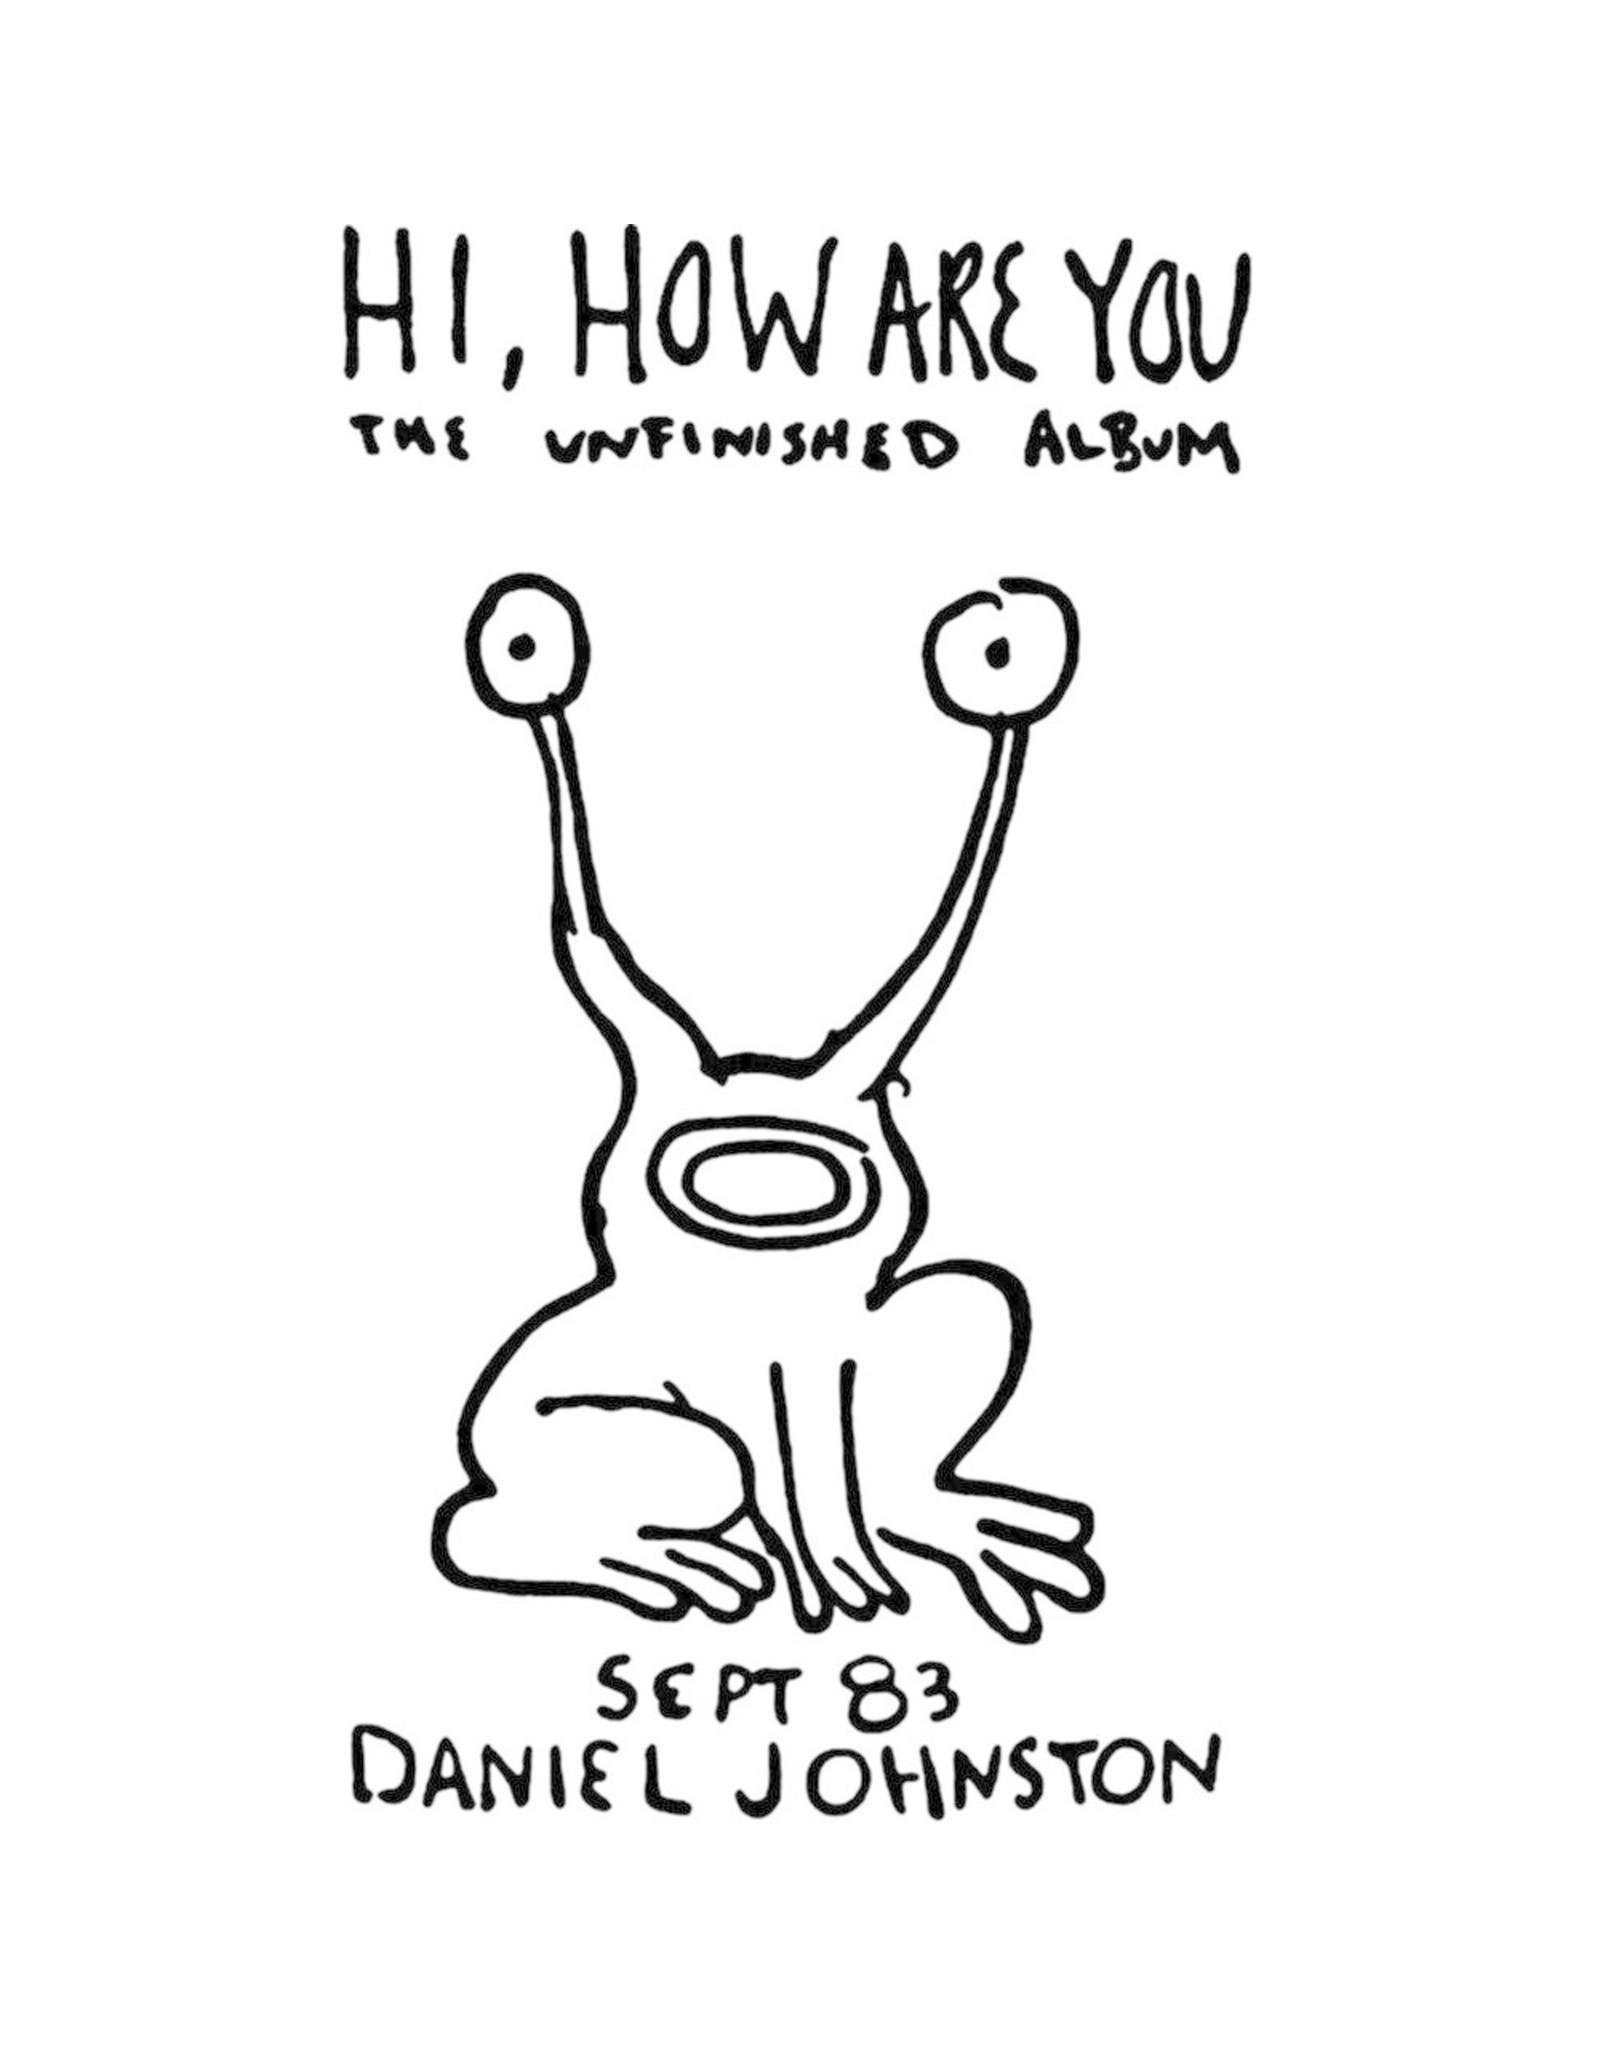 Daniel Johnston - Hi, How Are You / YIP JUMP MUSIC (35th Anniversary)